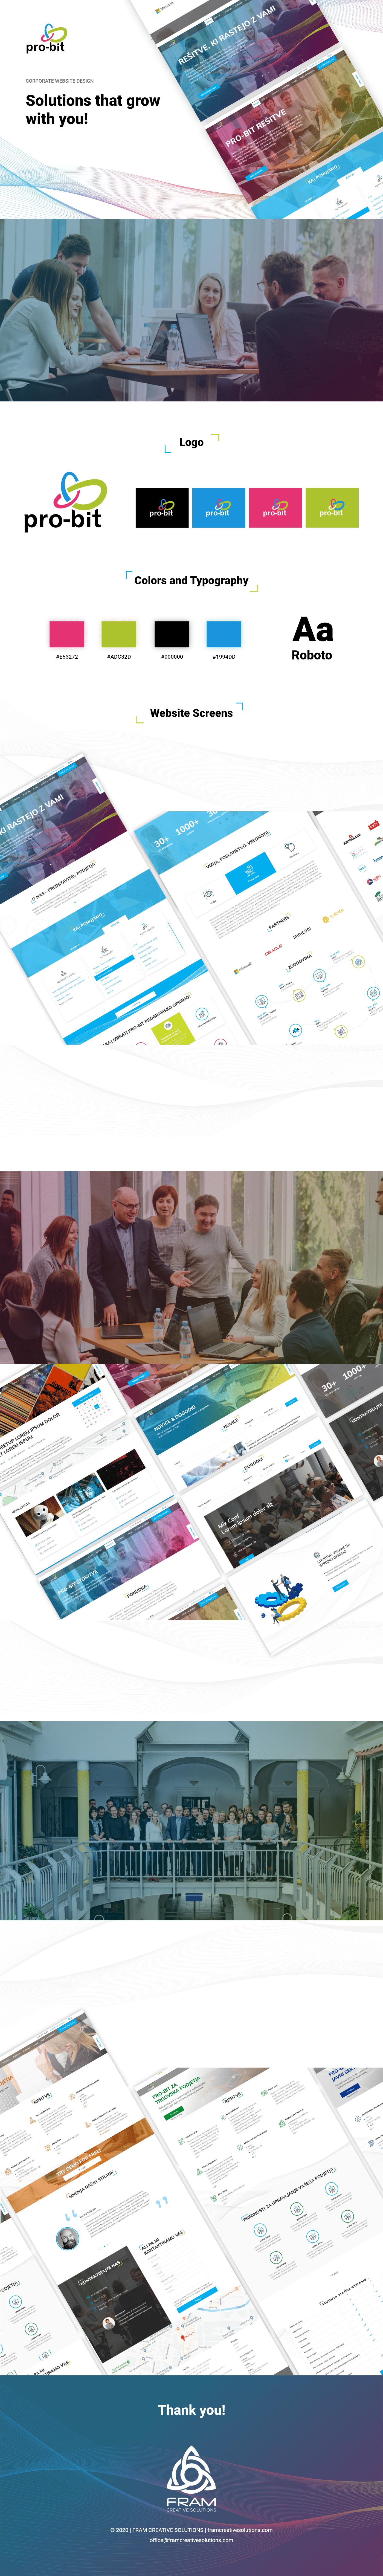 Website redesign Digital strategy UI ux